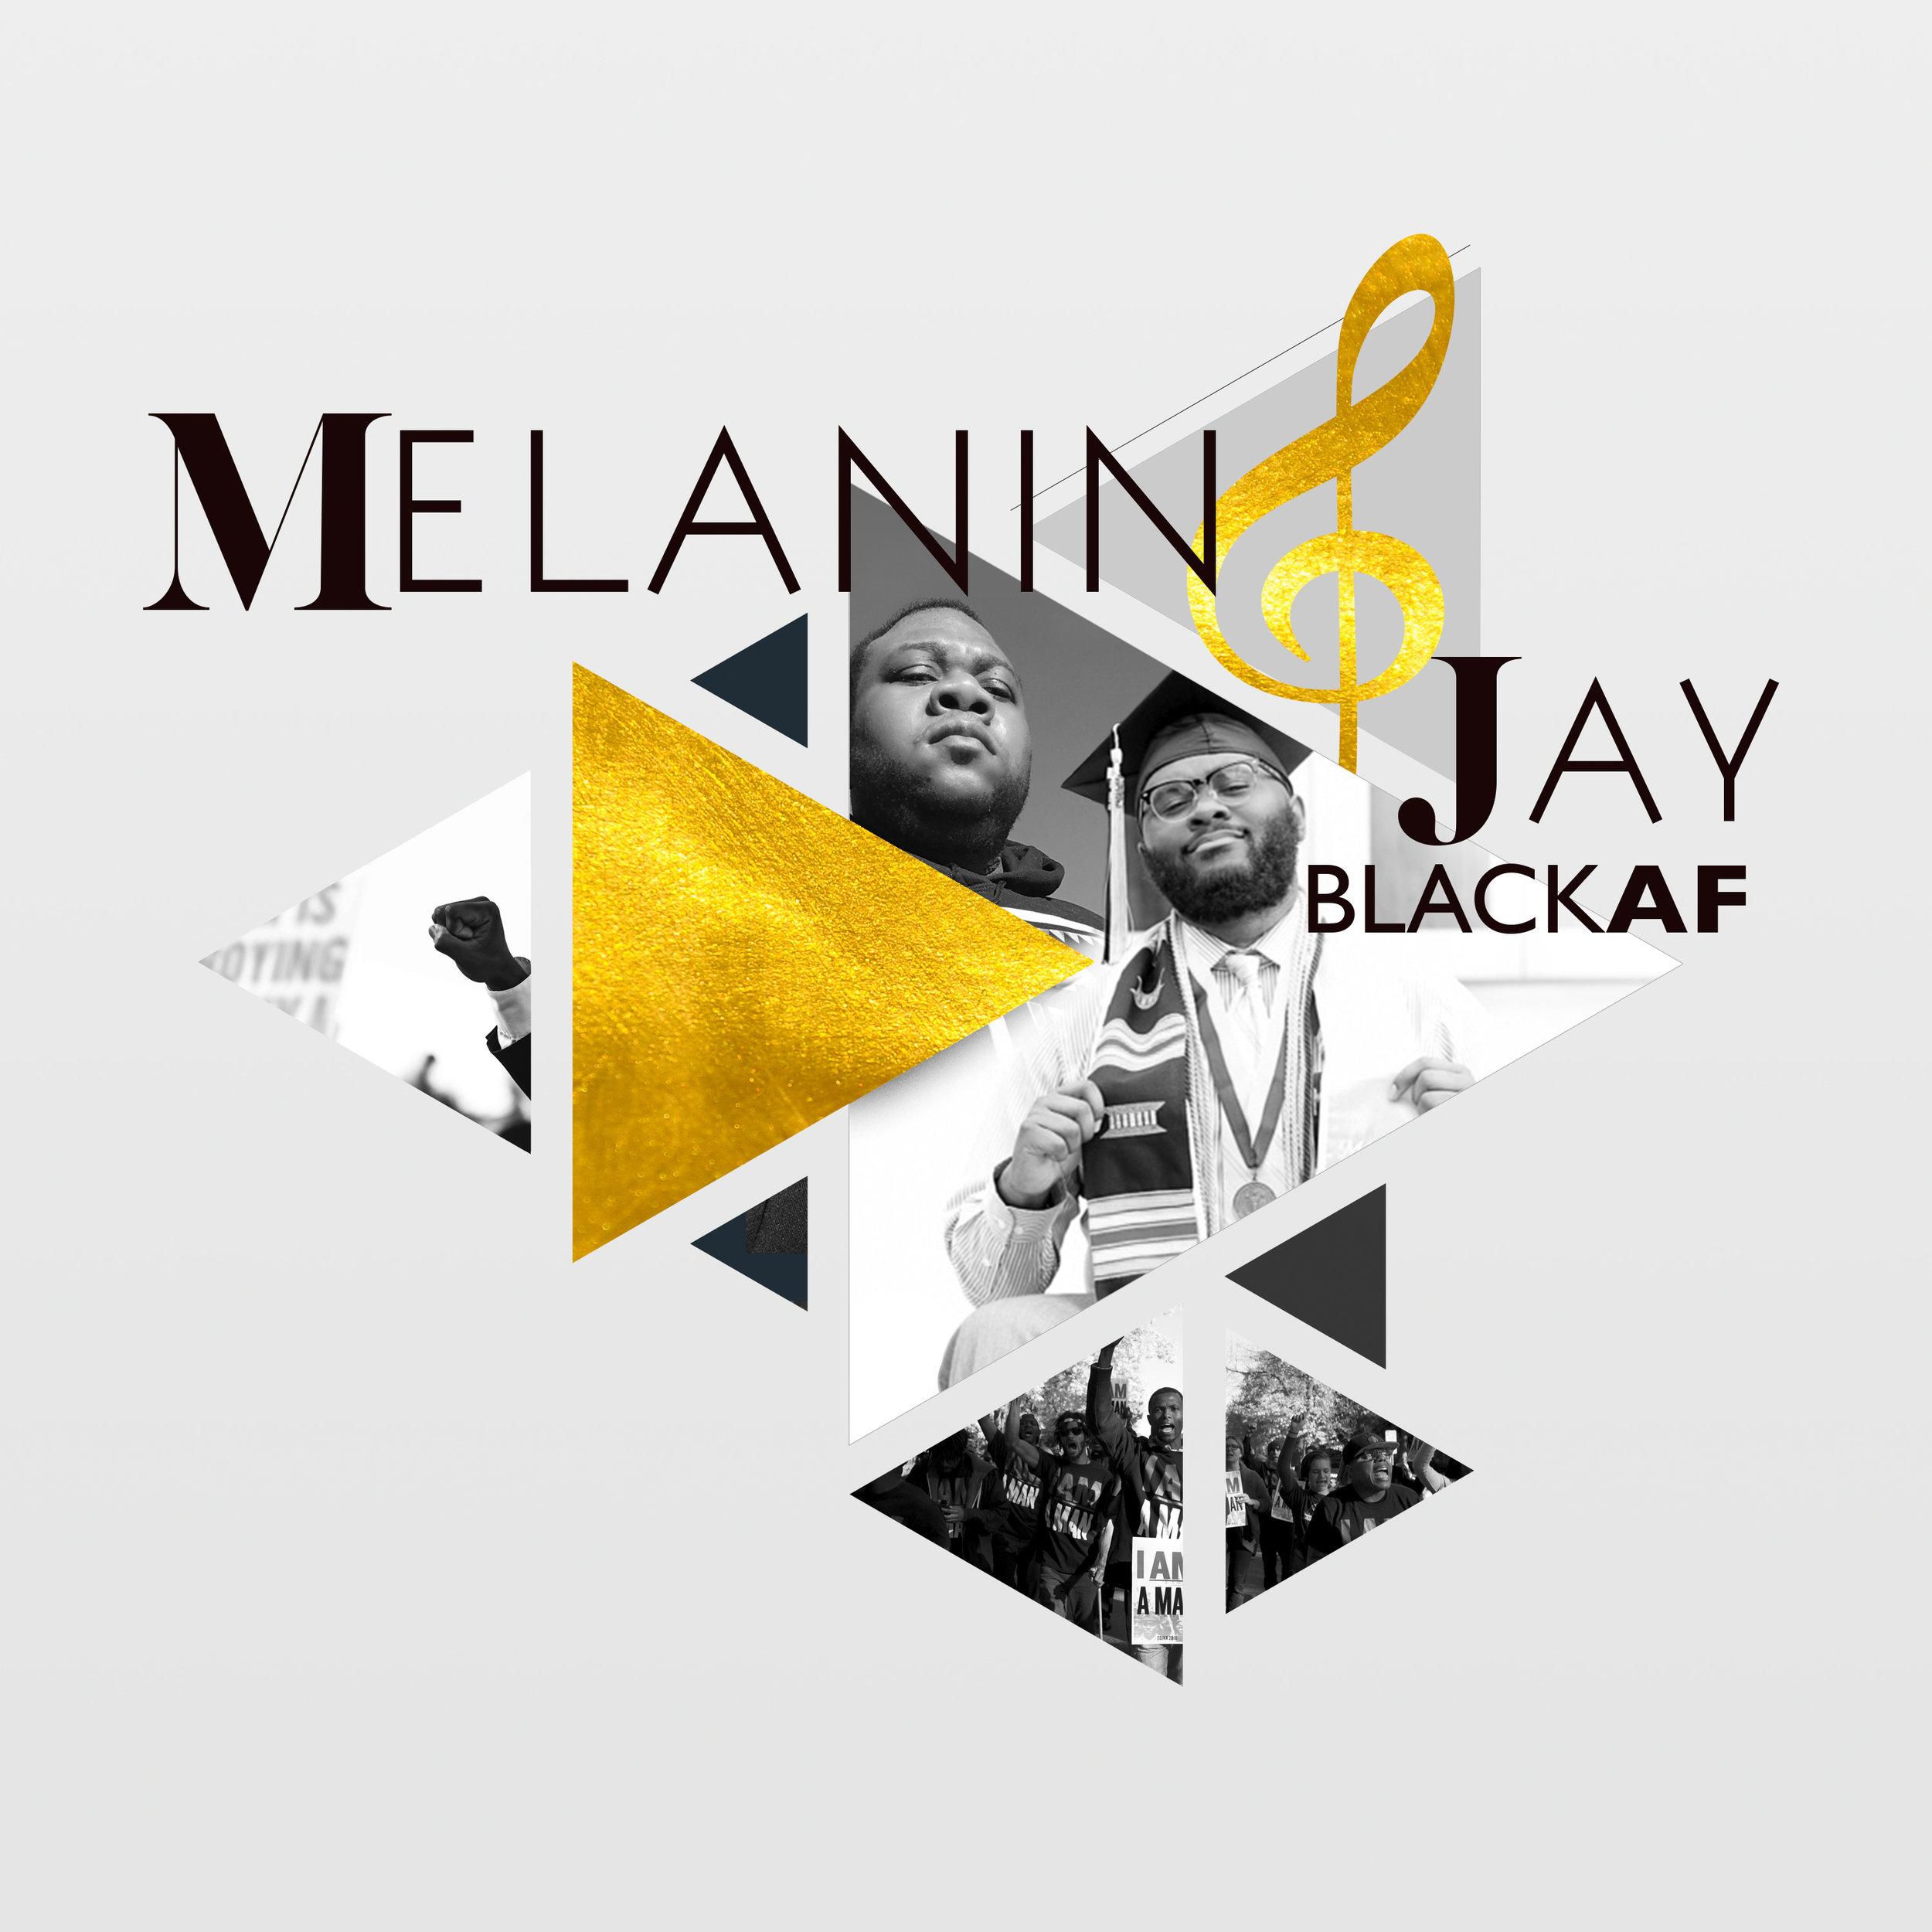 melanin-jay_3000x3000_Final-grey.jpg